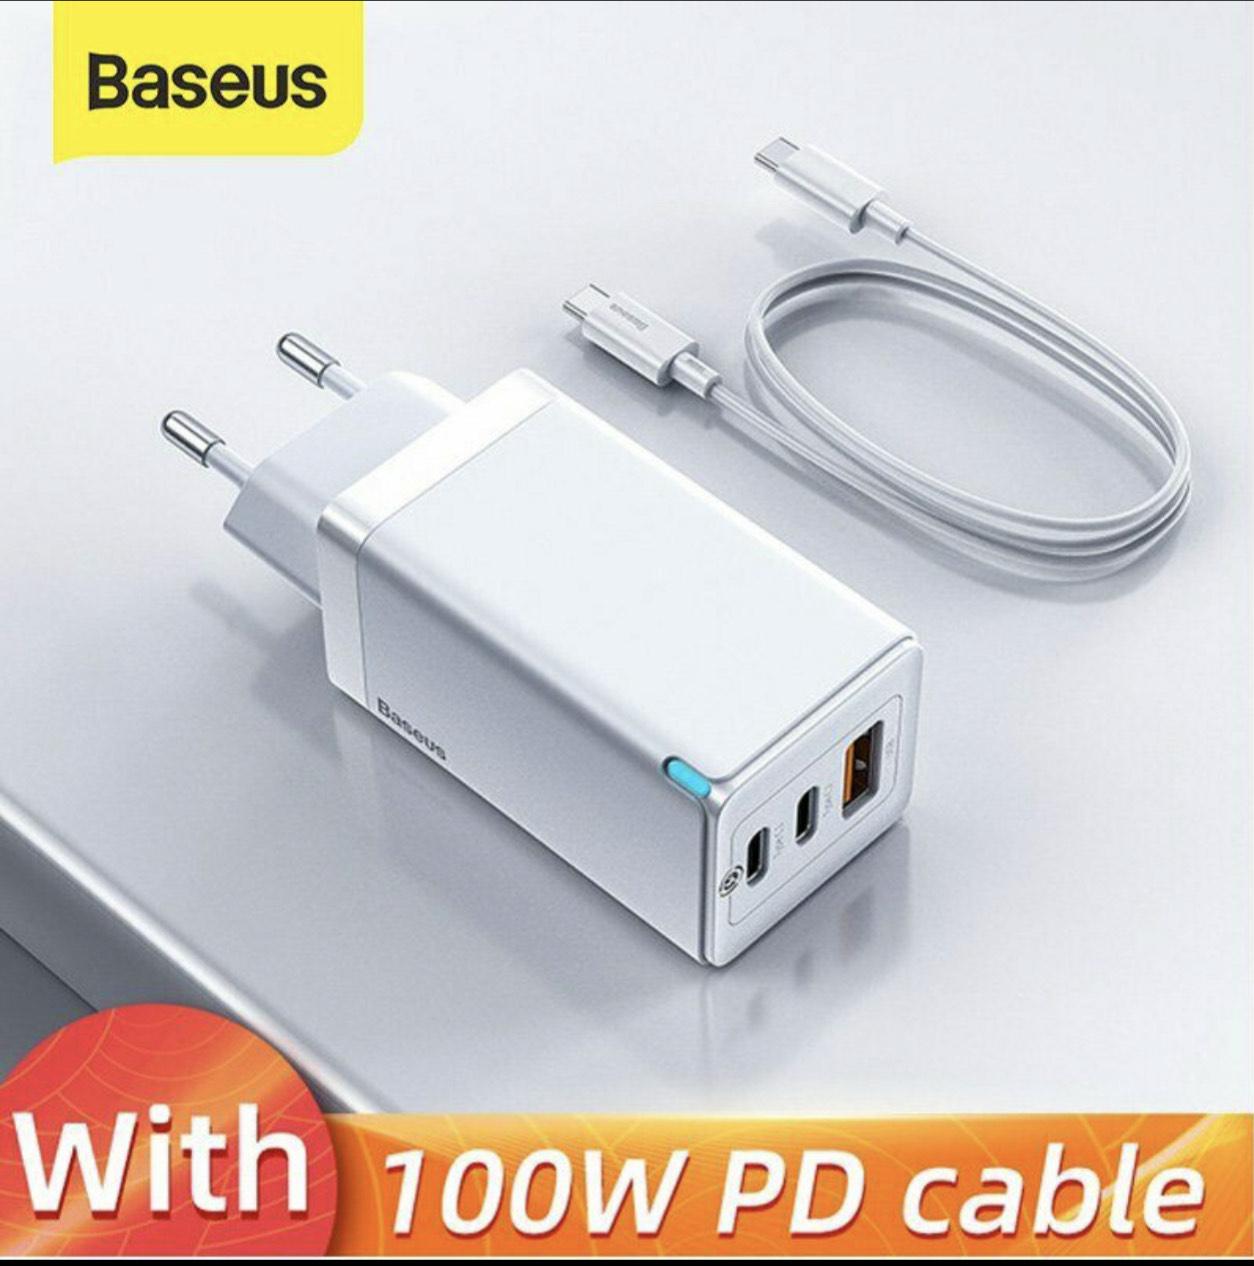 65W, 3 Ladeports, QC4.0 PD AFC, Baseus GaN Mini-Schnellladegerät EU, schwarz, mit USB-C Kabel